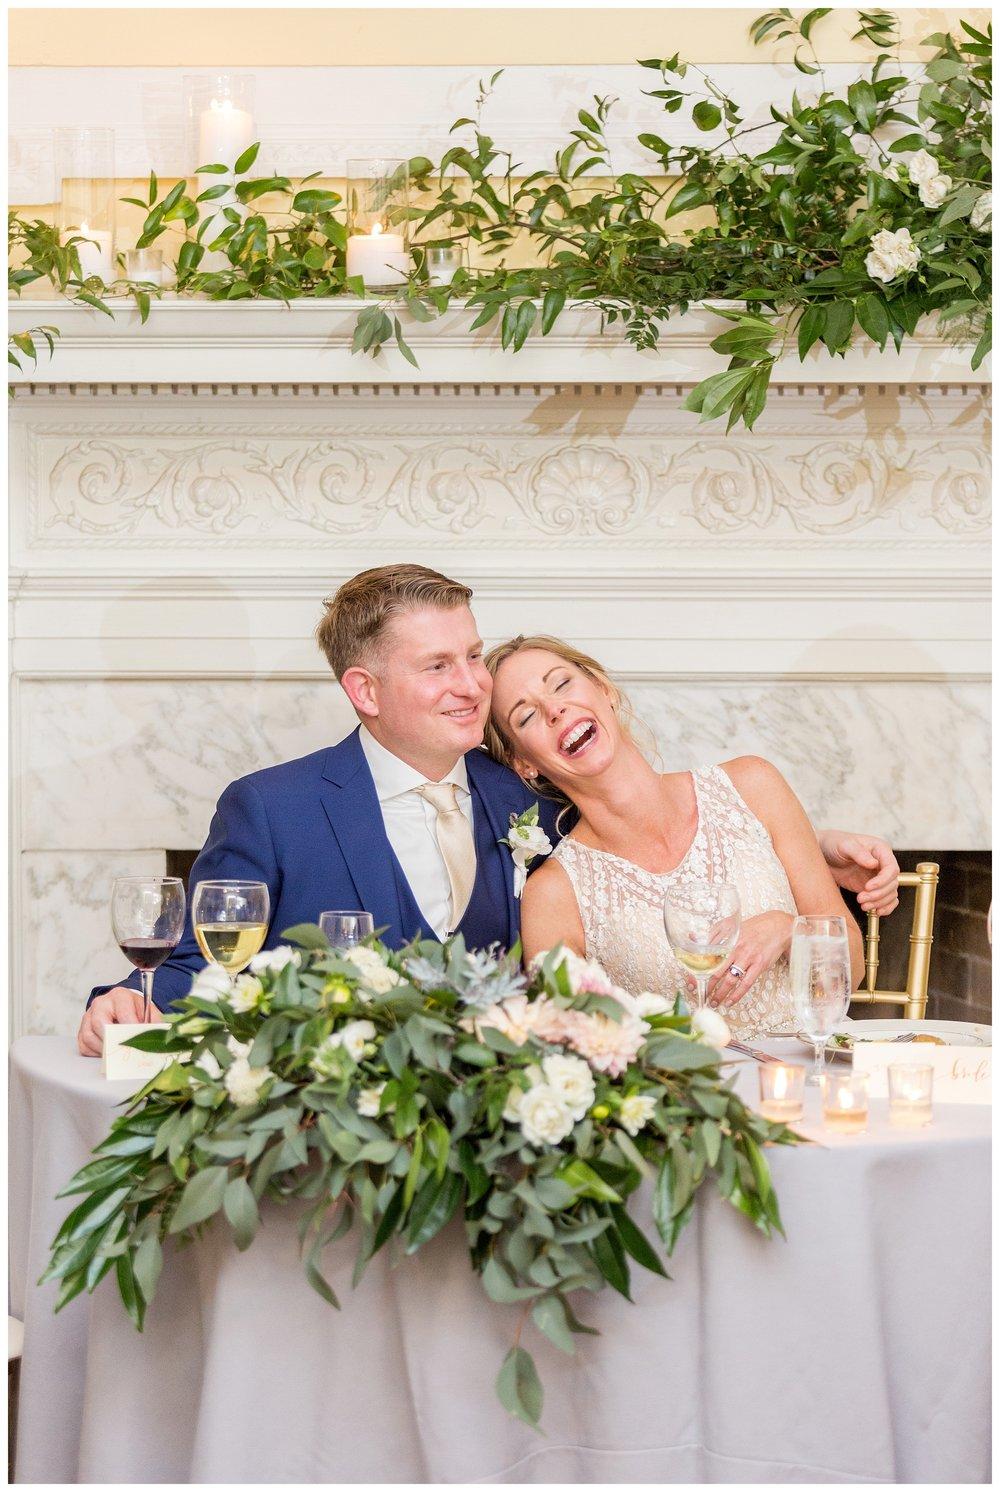 Meridian Hill Park Wedding | Washington DC Wedding Photographer Kir Tuben_0103.jpg